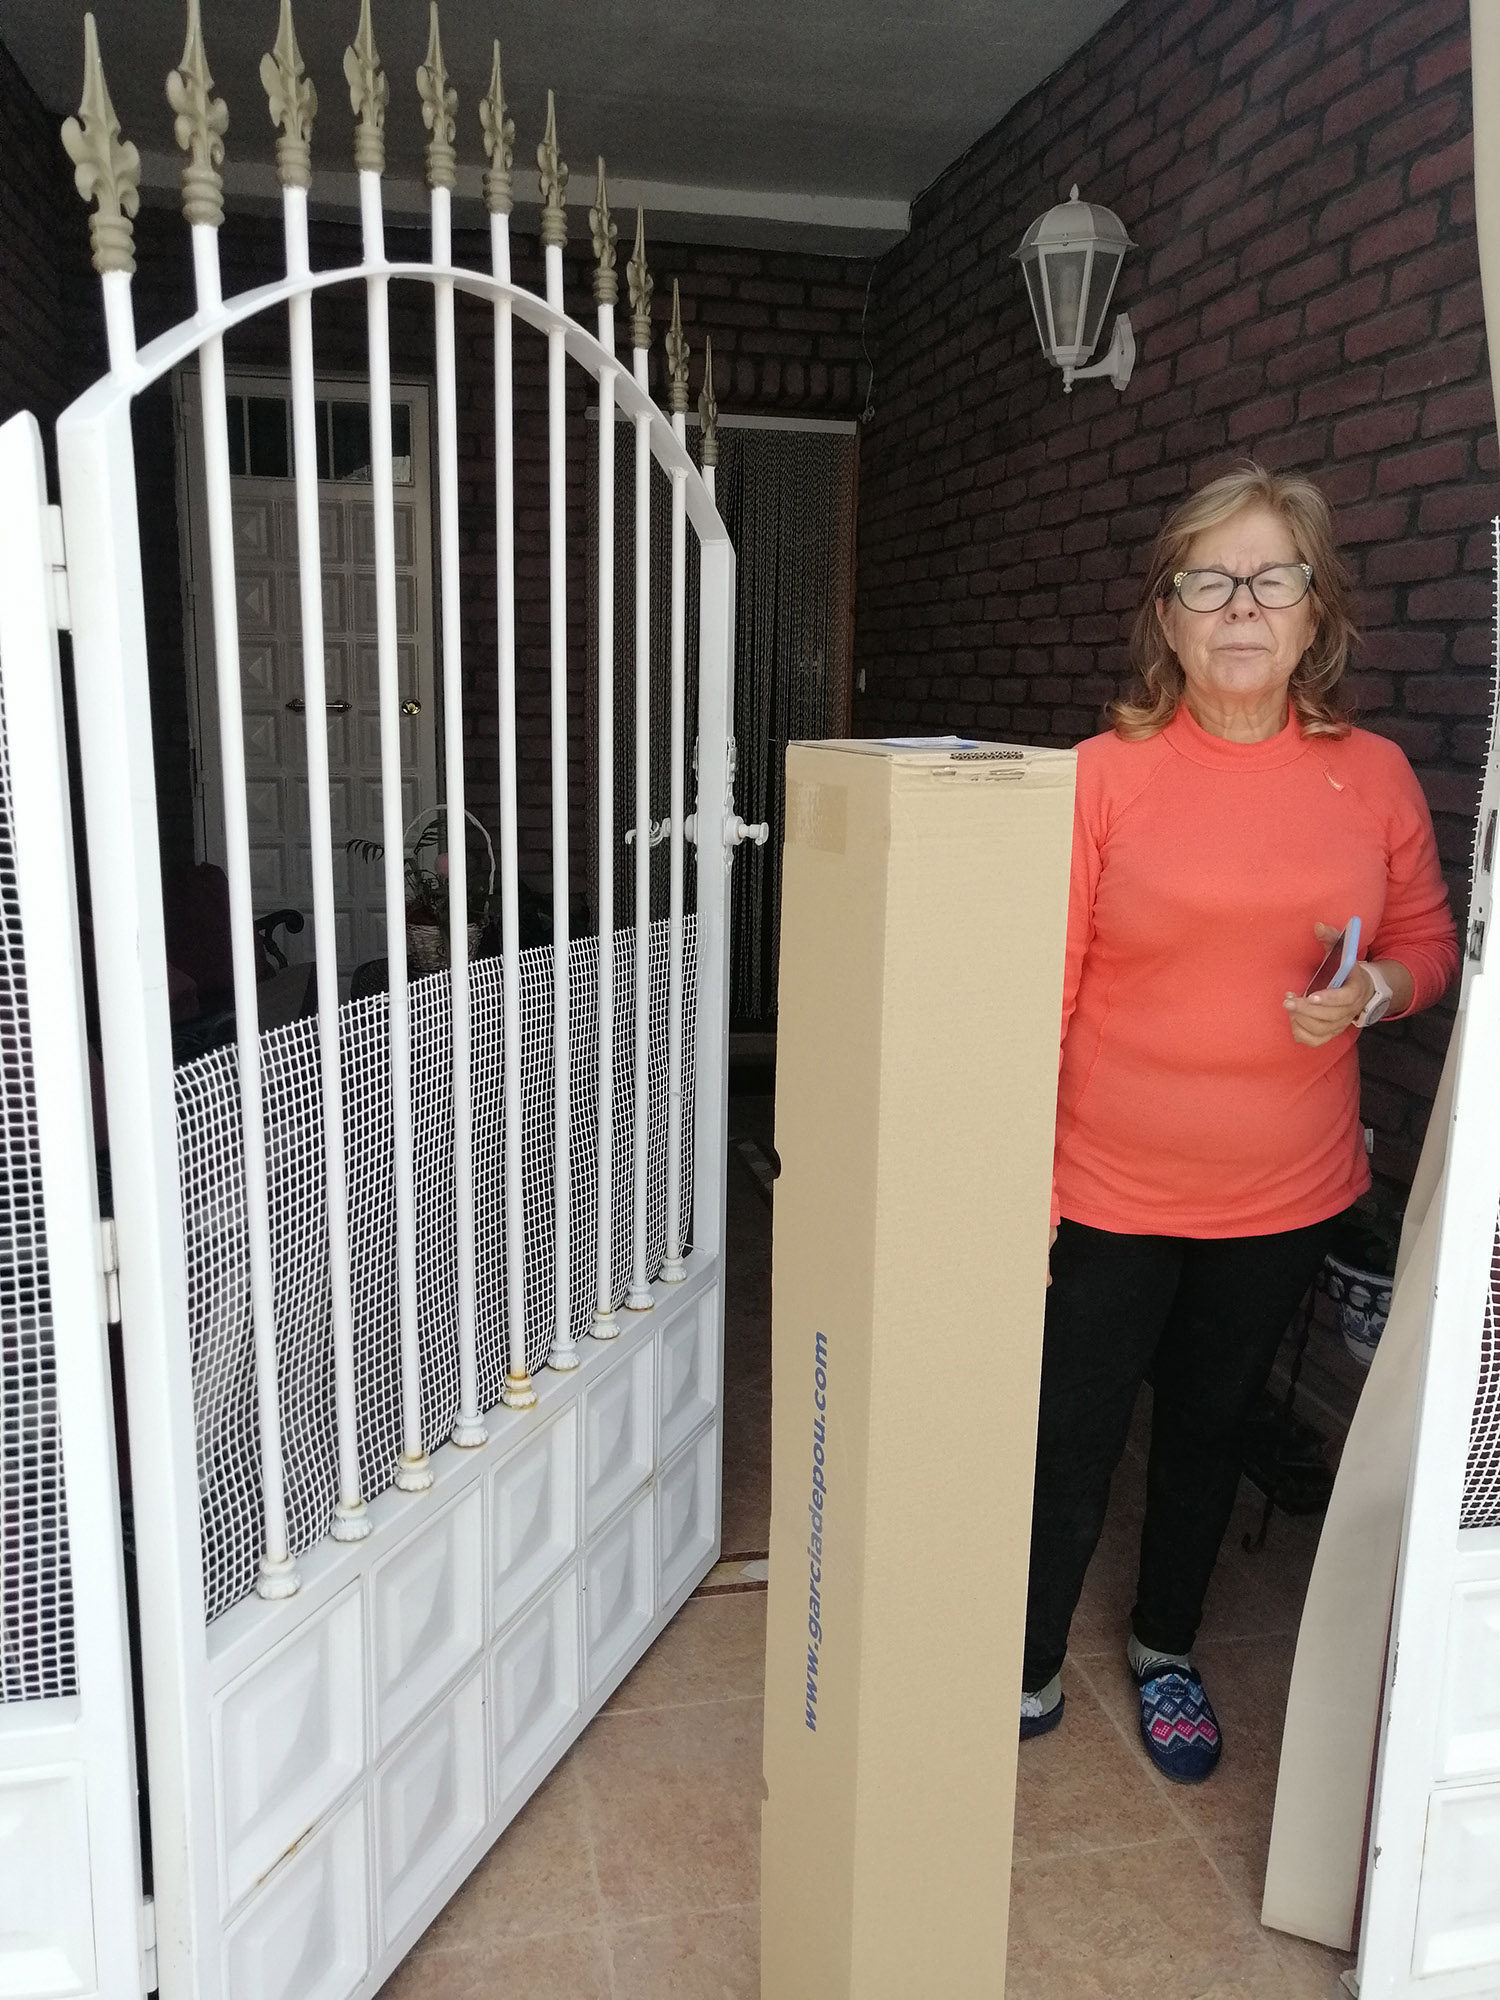 Entrega de material a Mari Carmen Vega para la elaboración de material de protección.